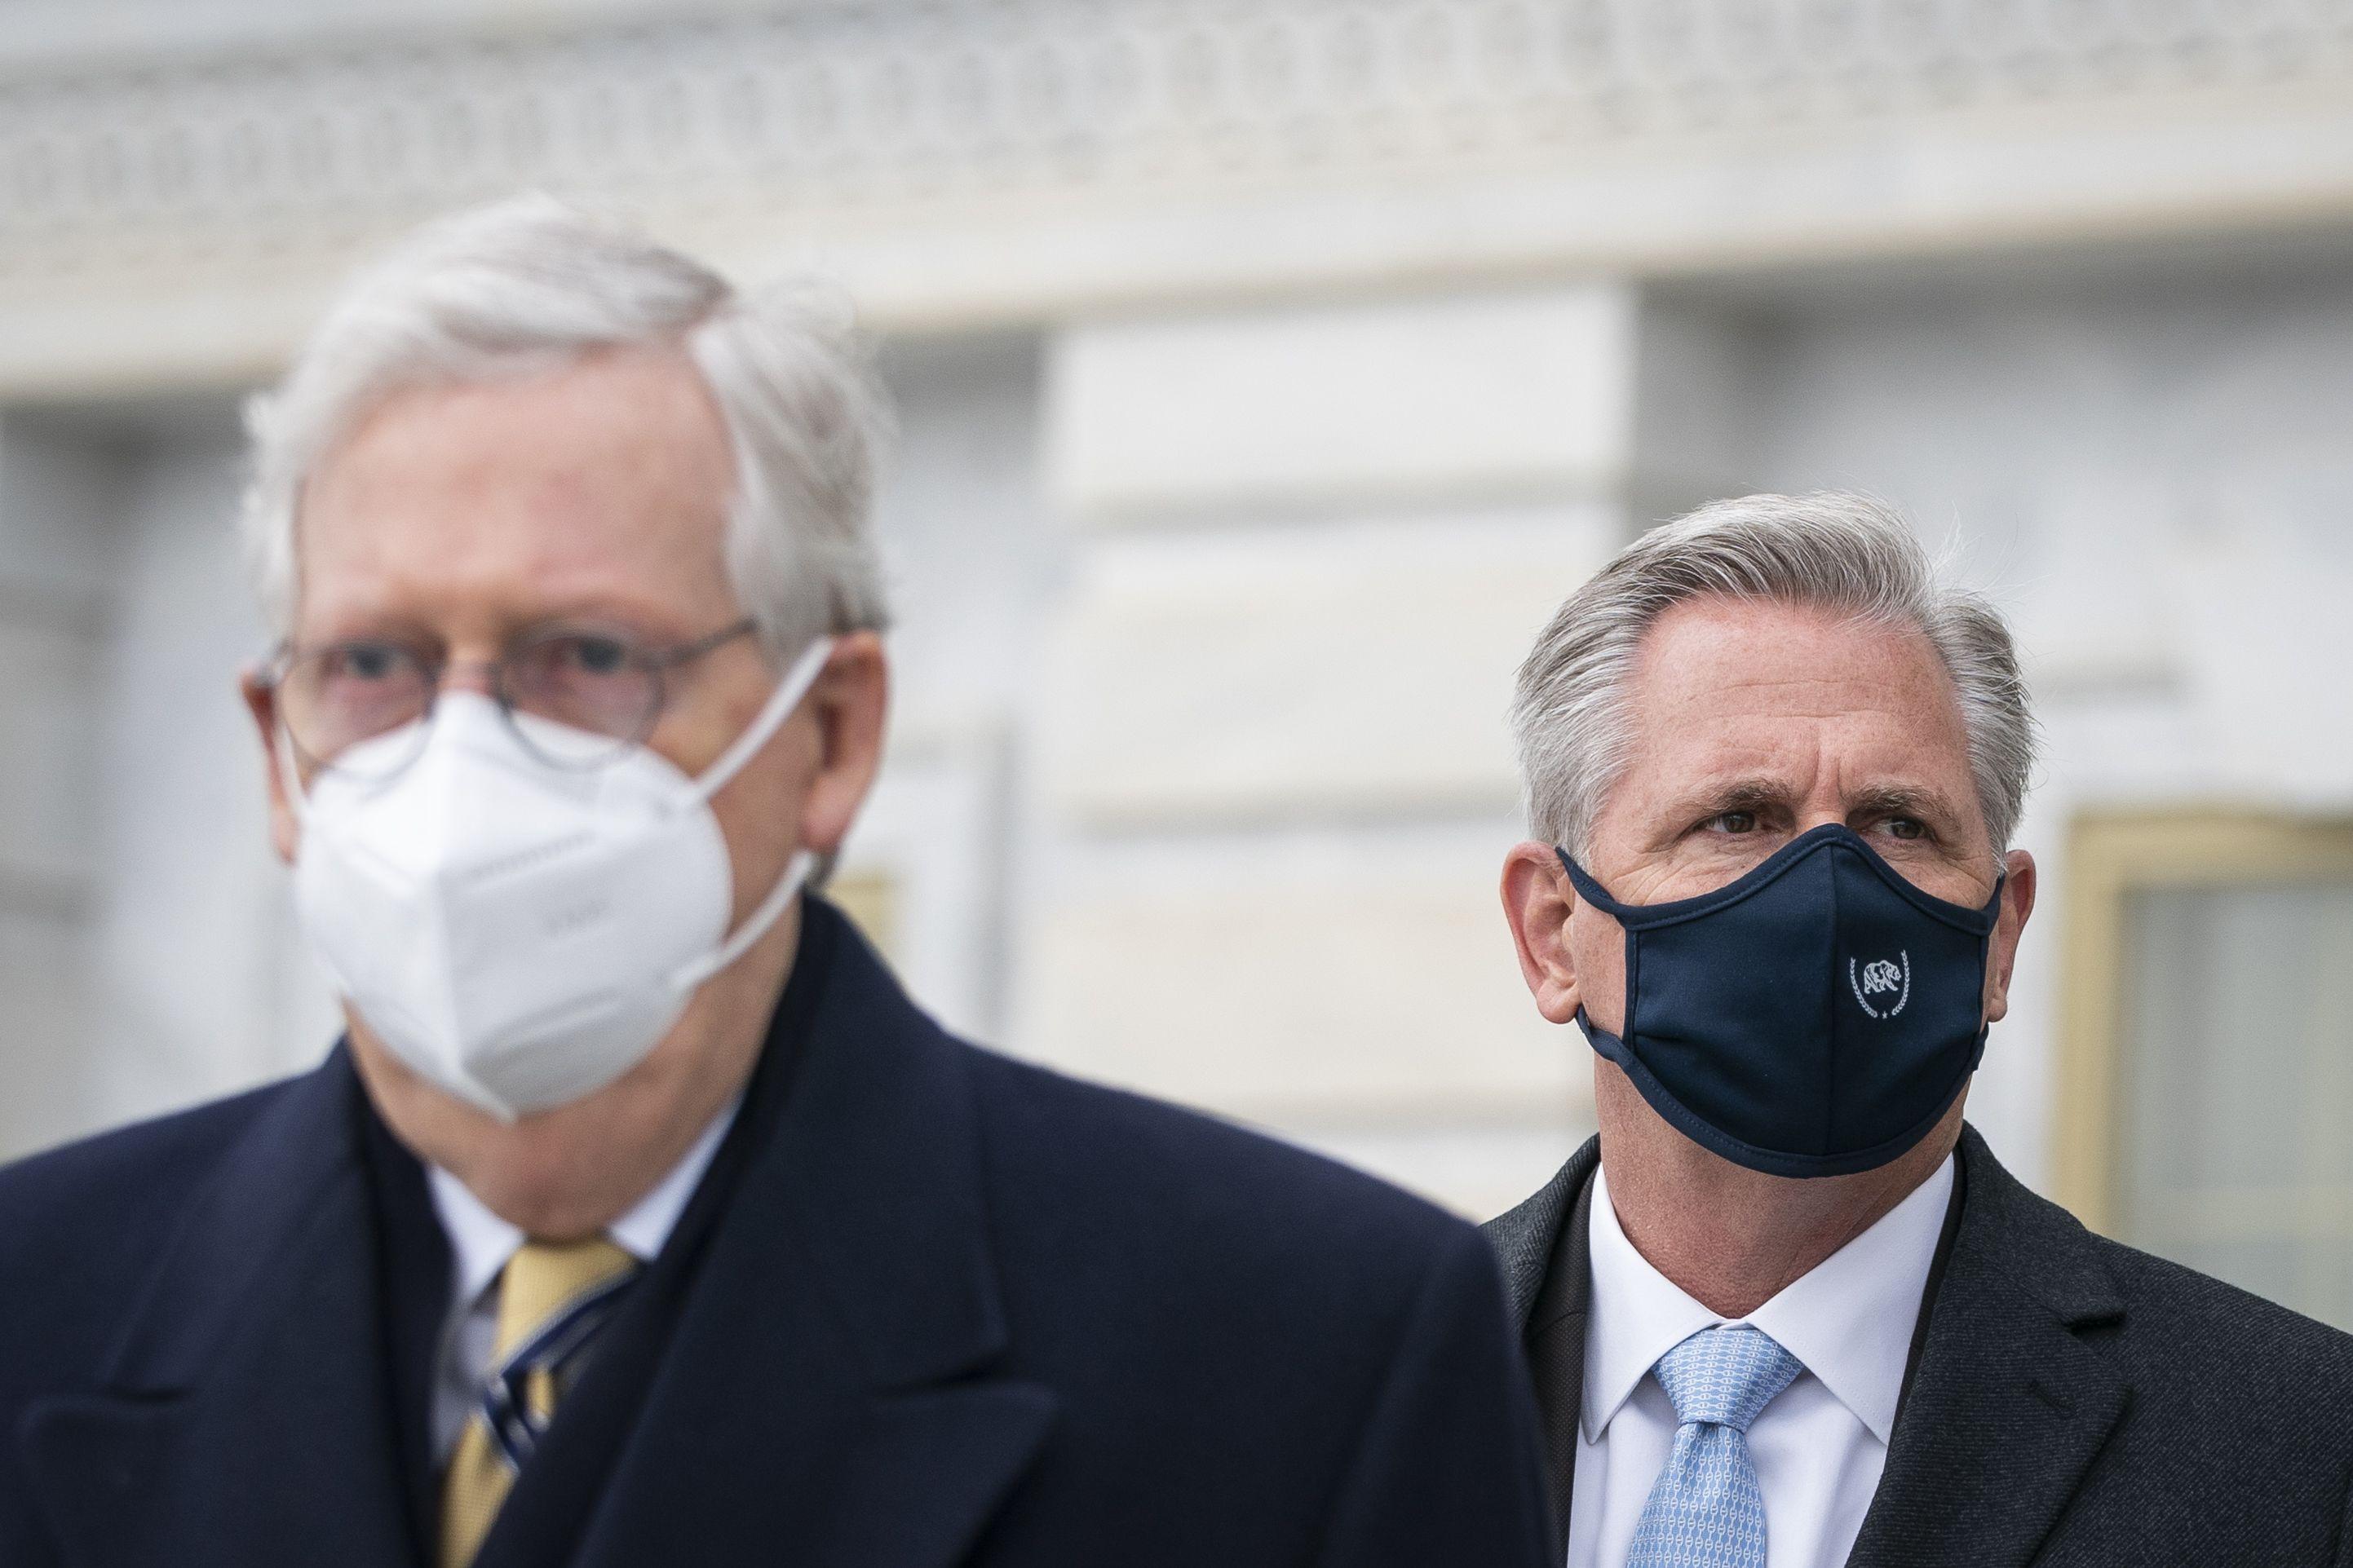 Republicans Have a Major Problem. Soon It Could Be Everyone's Problem.